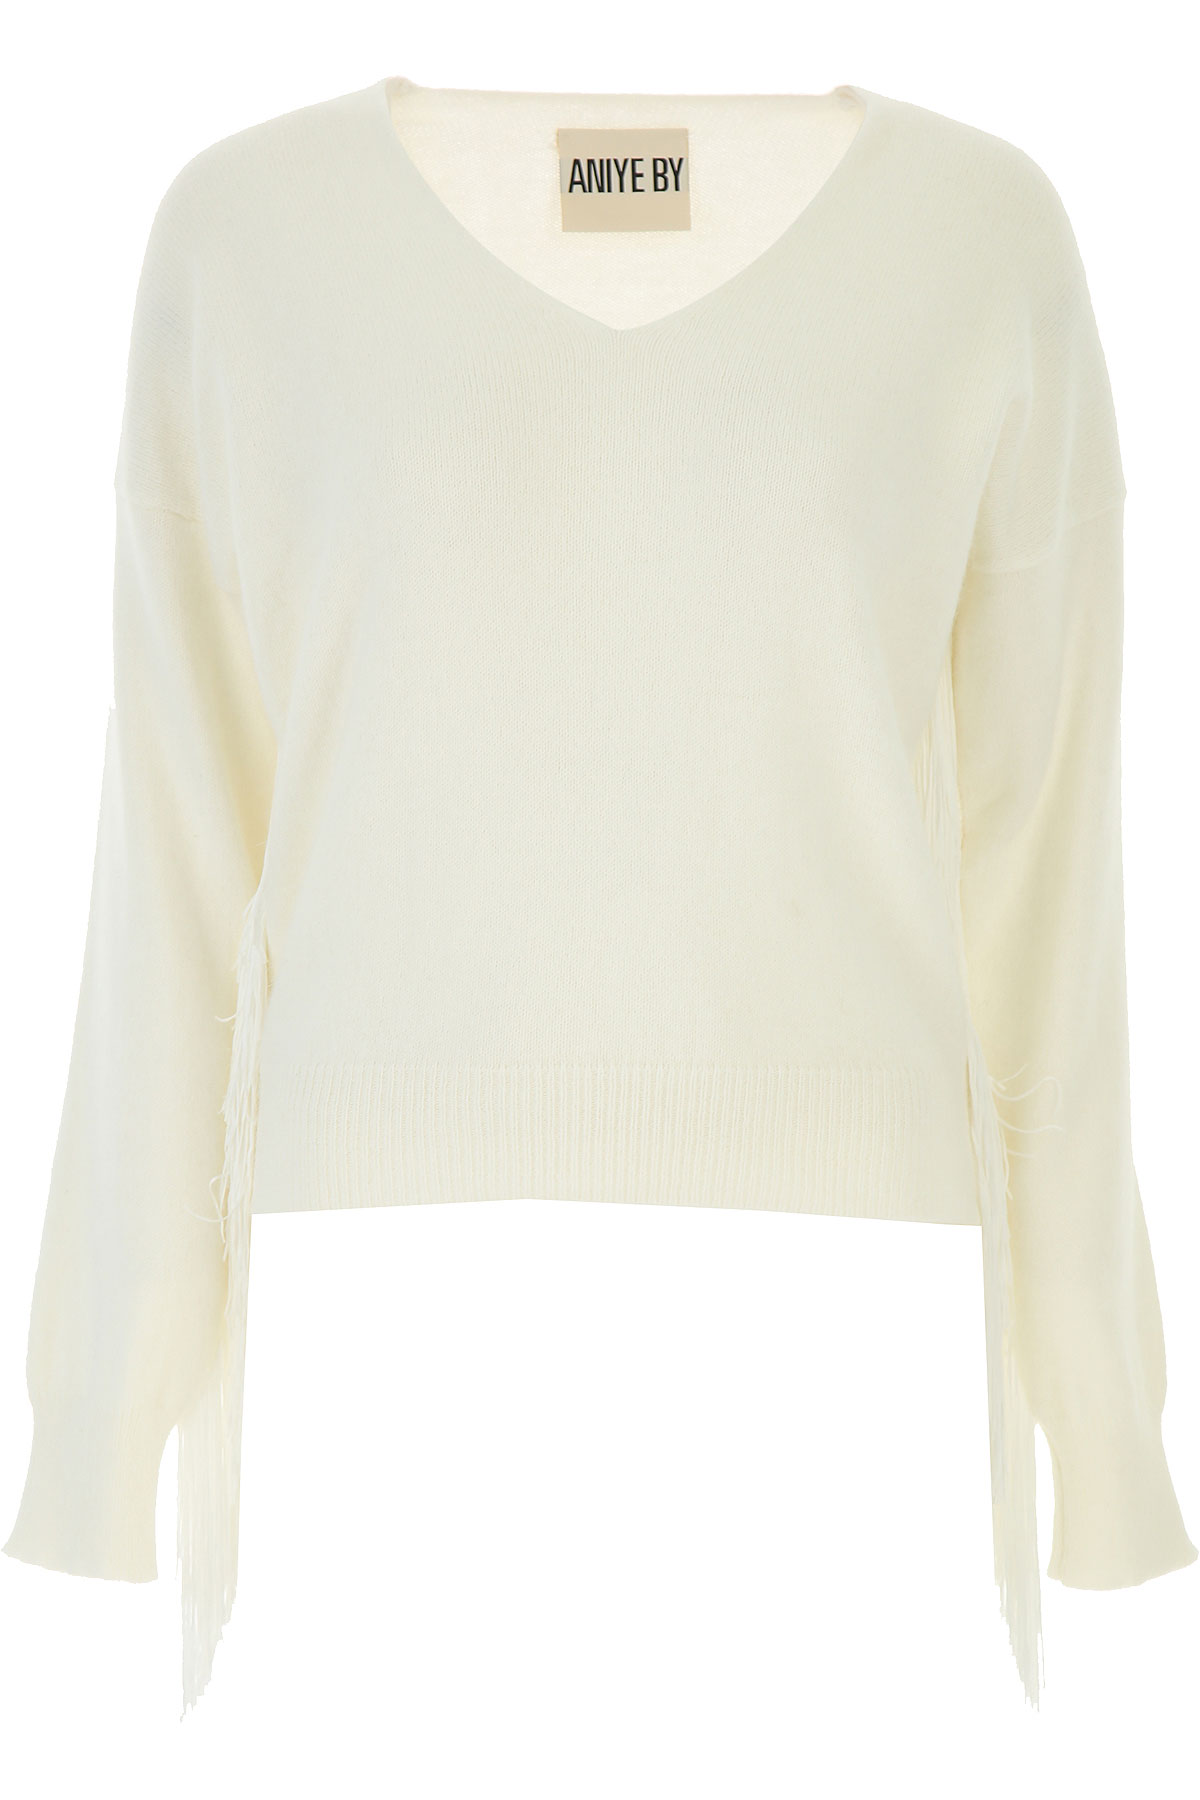 Aniye By Sweater for Women Jumper On Sale, Cream White, Angora, 2019, 2 4 6